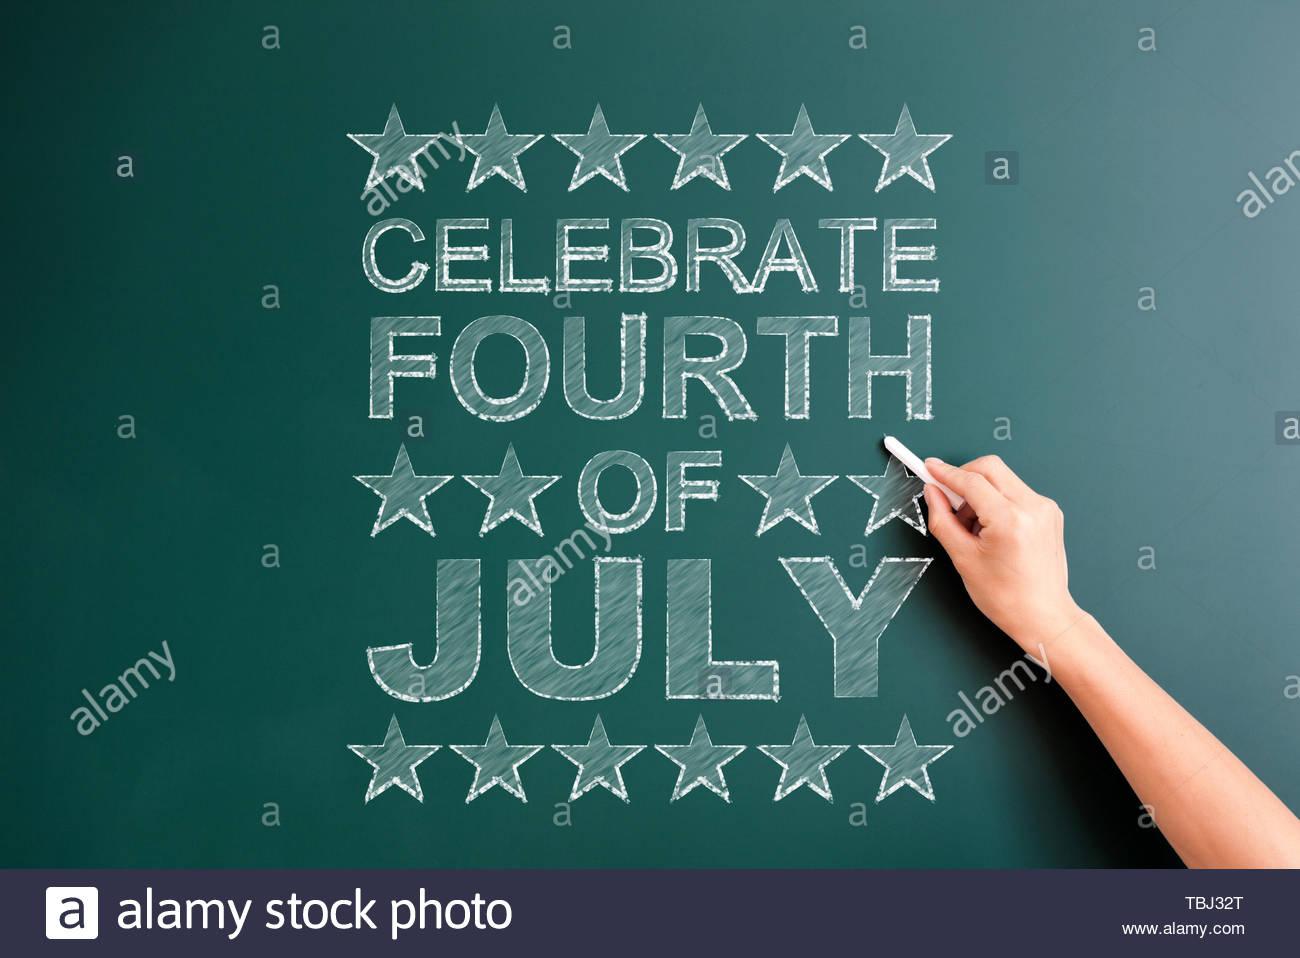 US national day slogan written on blackboard - Stock Image